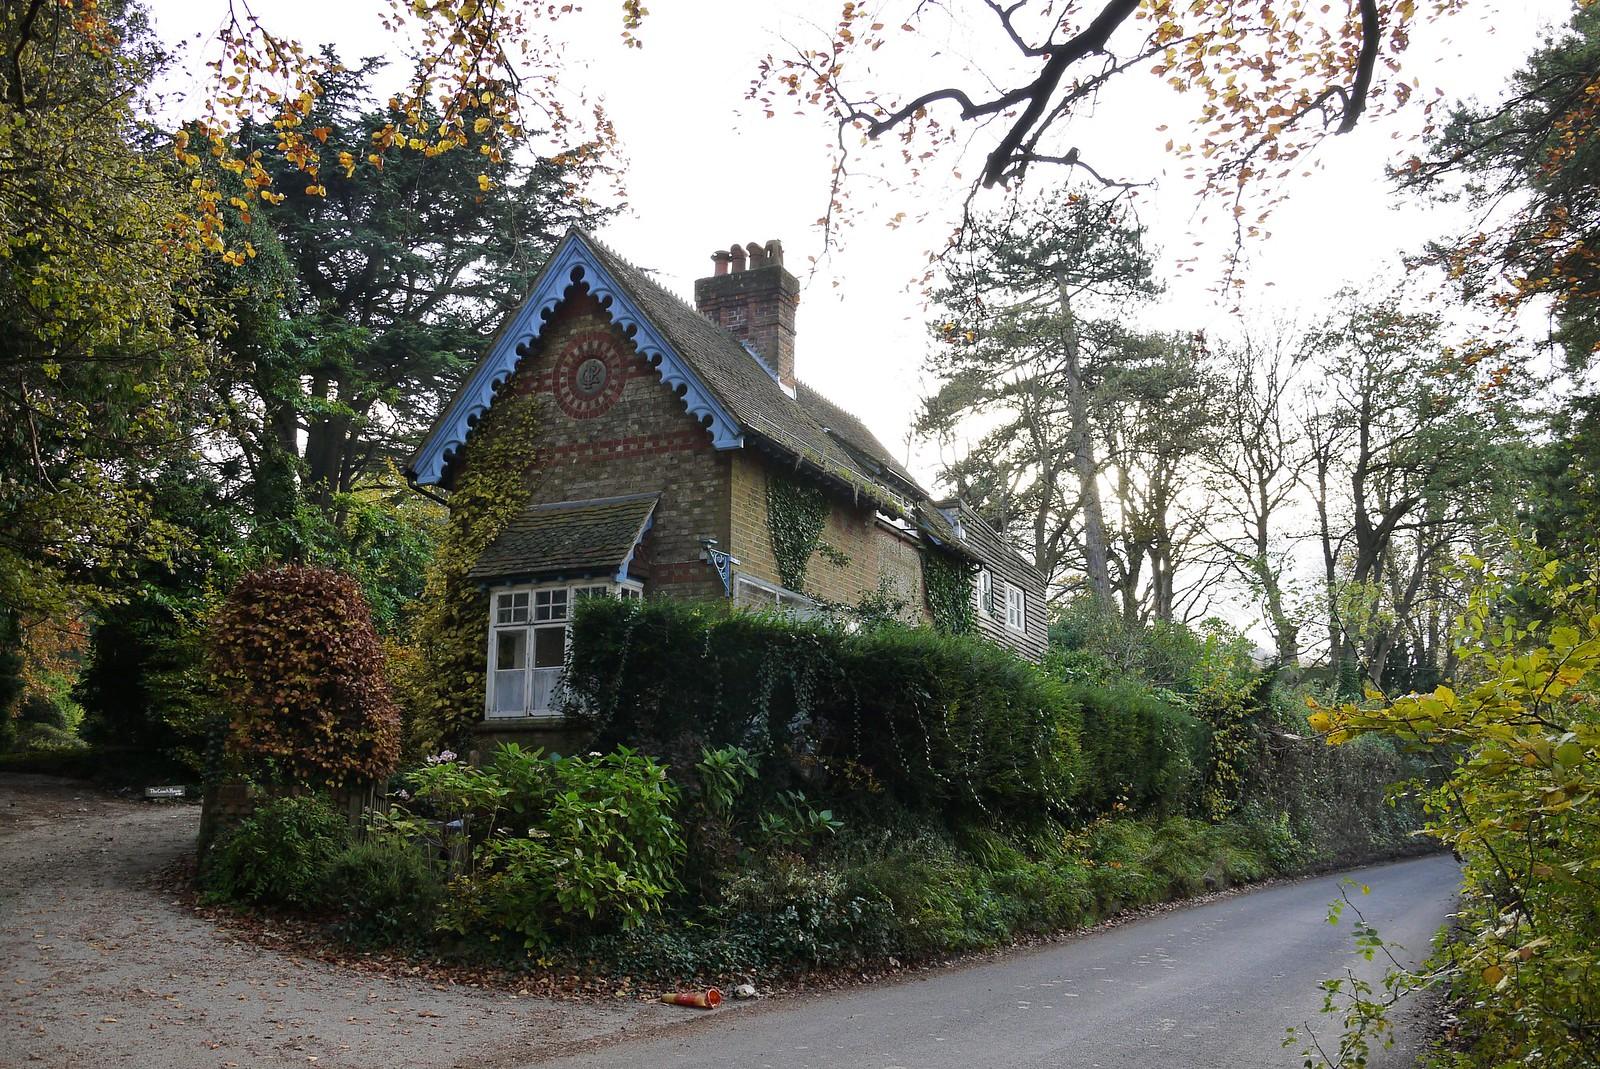 Shacklands Road, Shoreham Otford to Eynsford